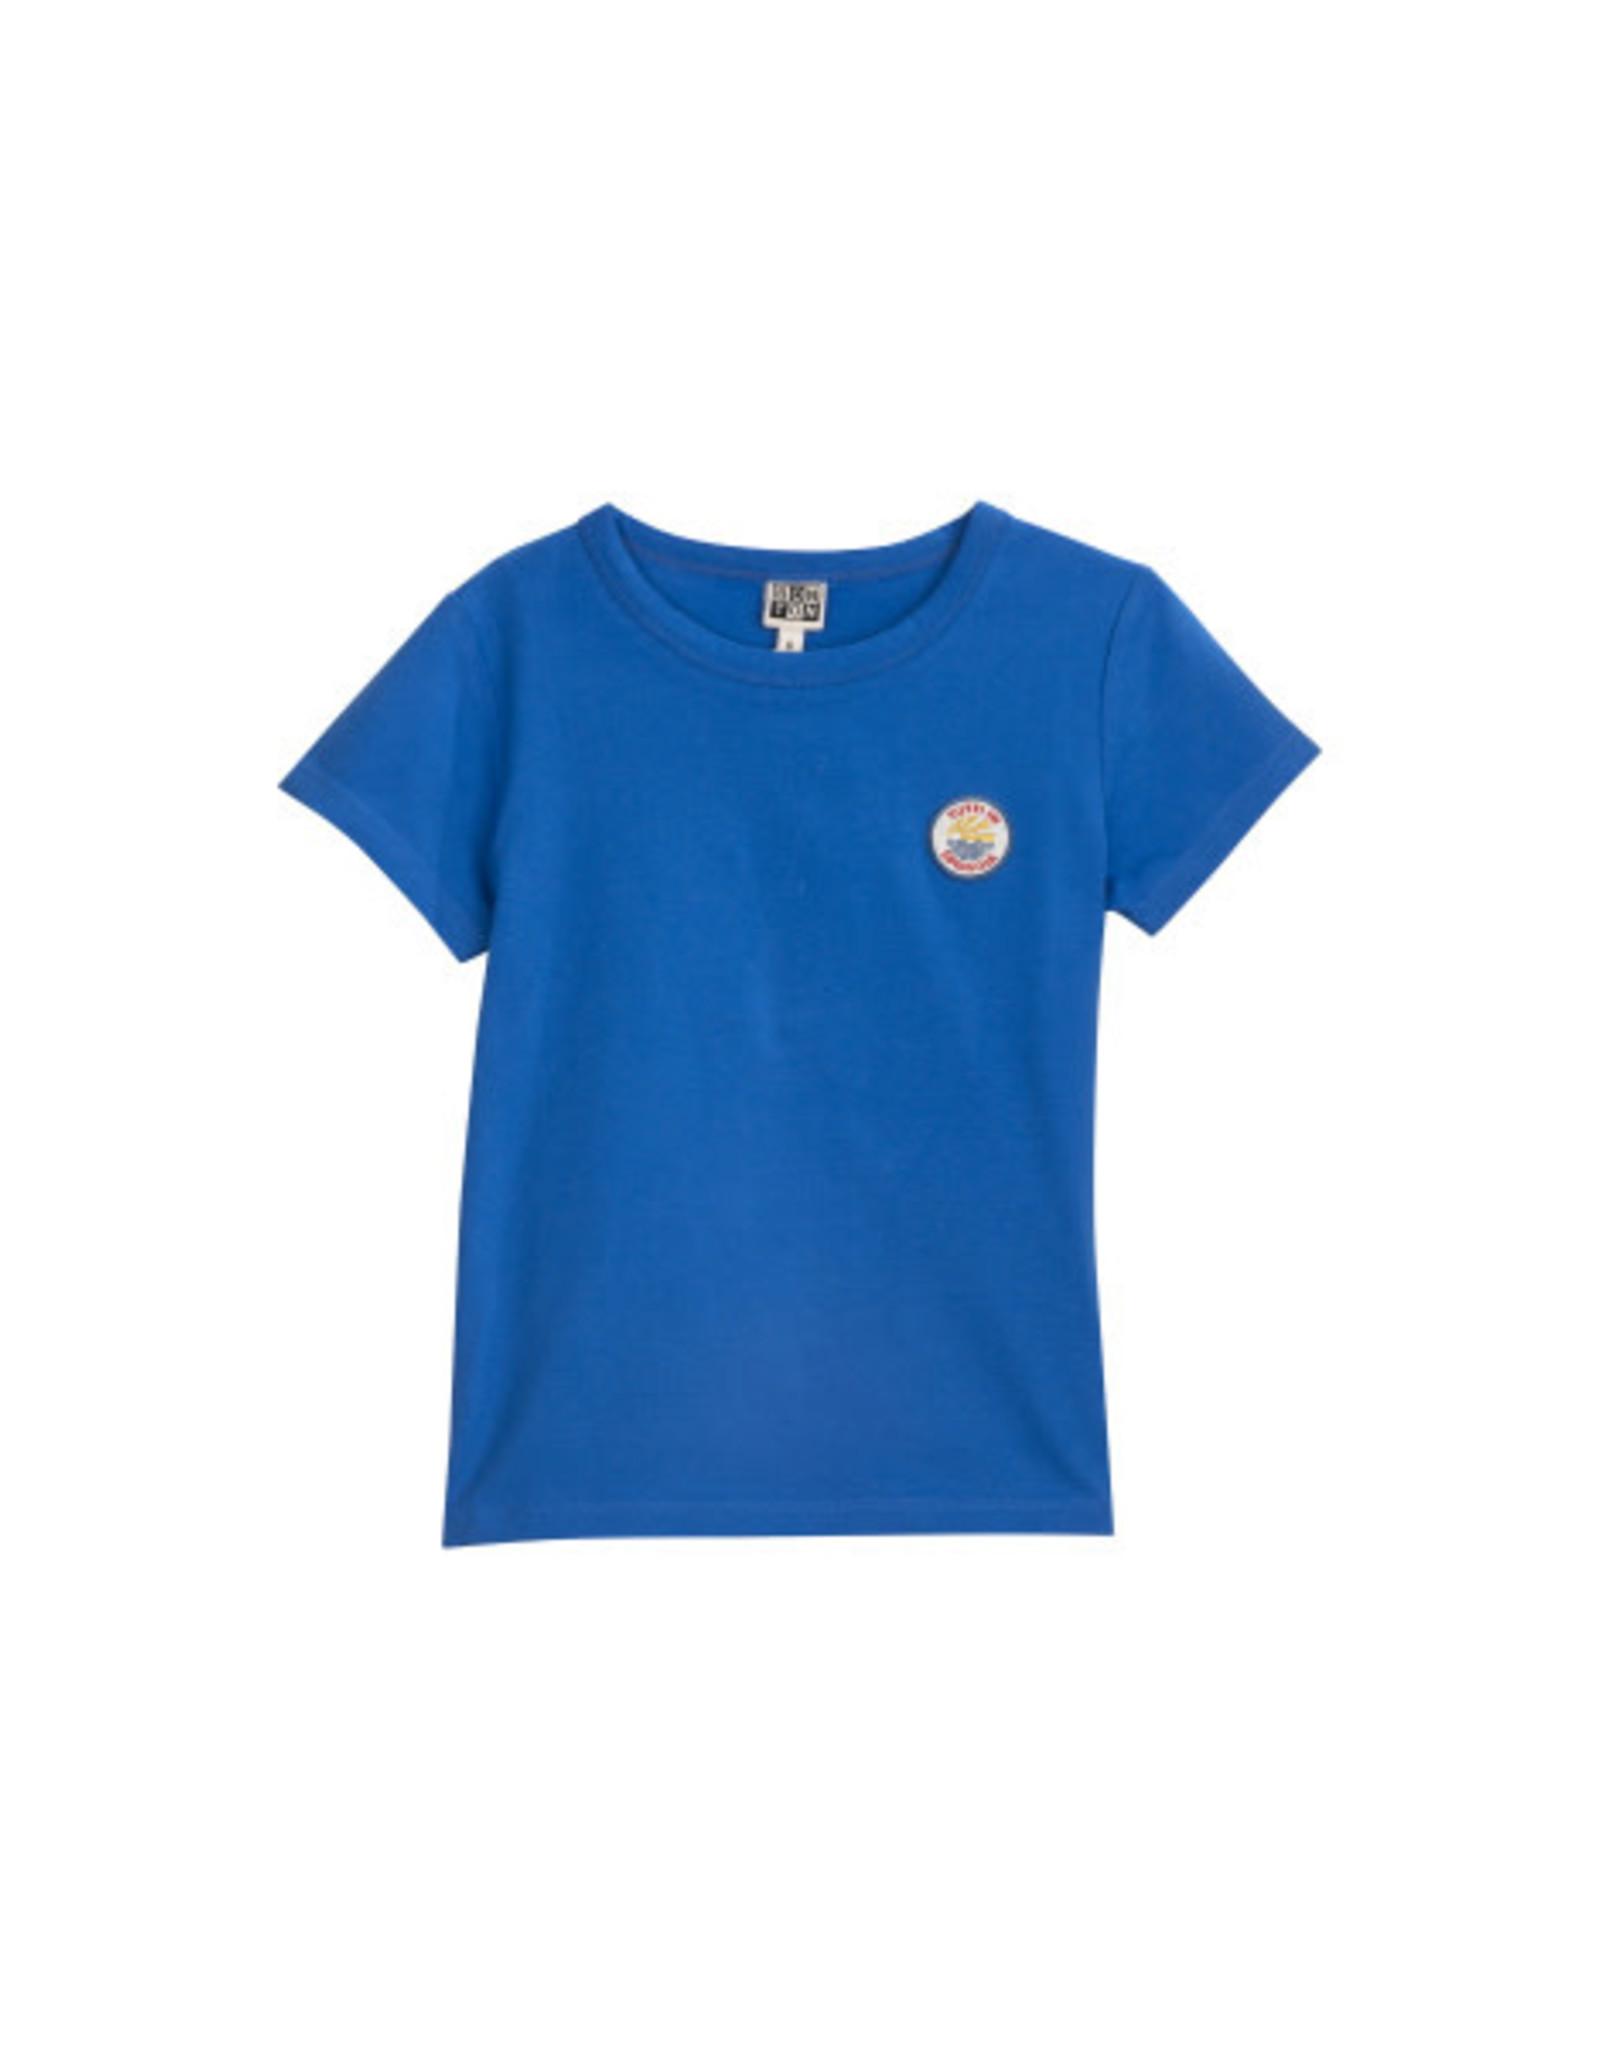 Bonton SS21 TSbadge t-shirt